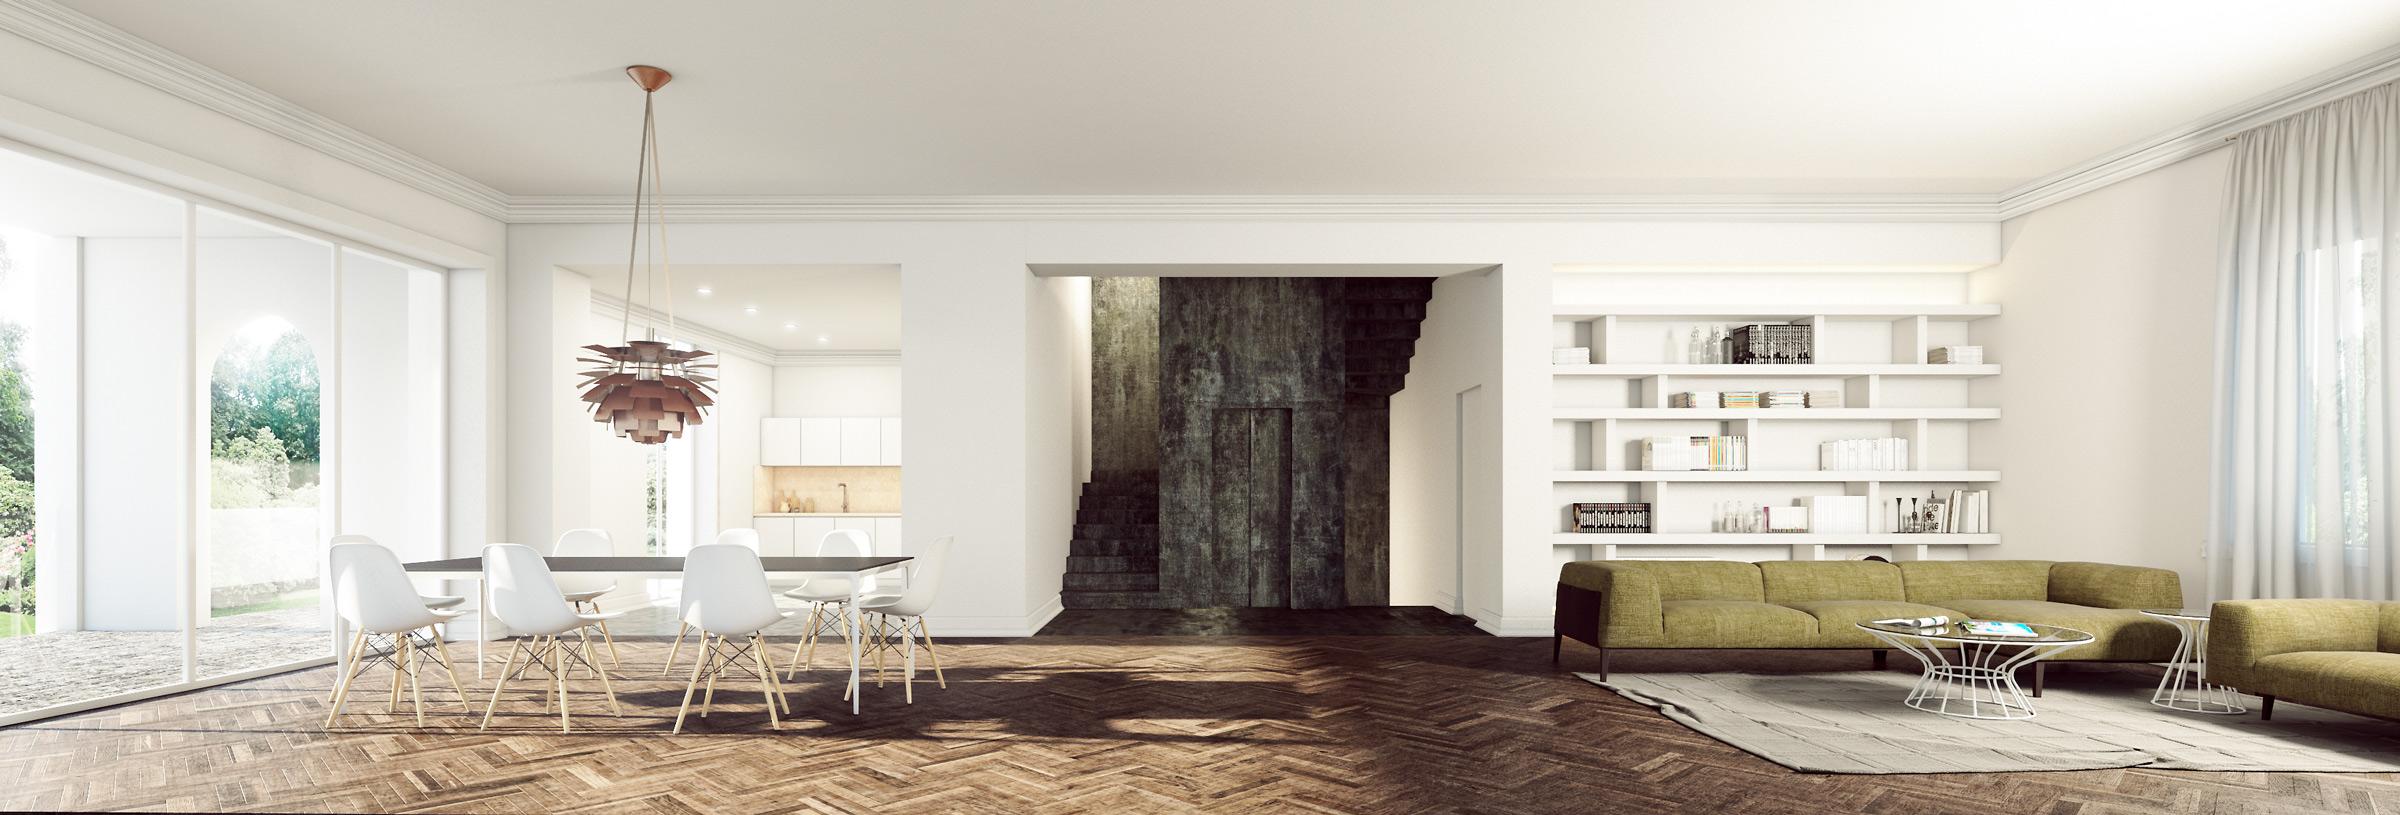 render-residence-sirmione-lago-livingroom-white-light-bright-parquet